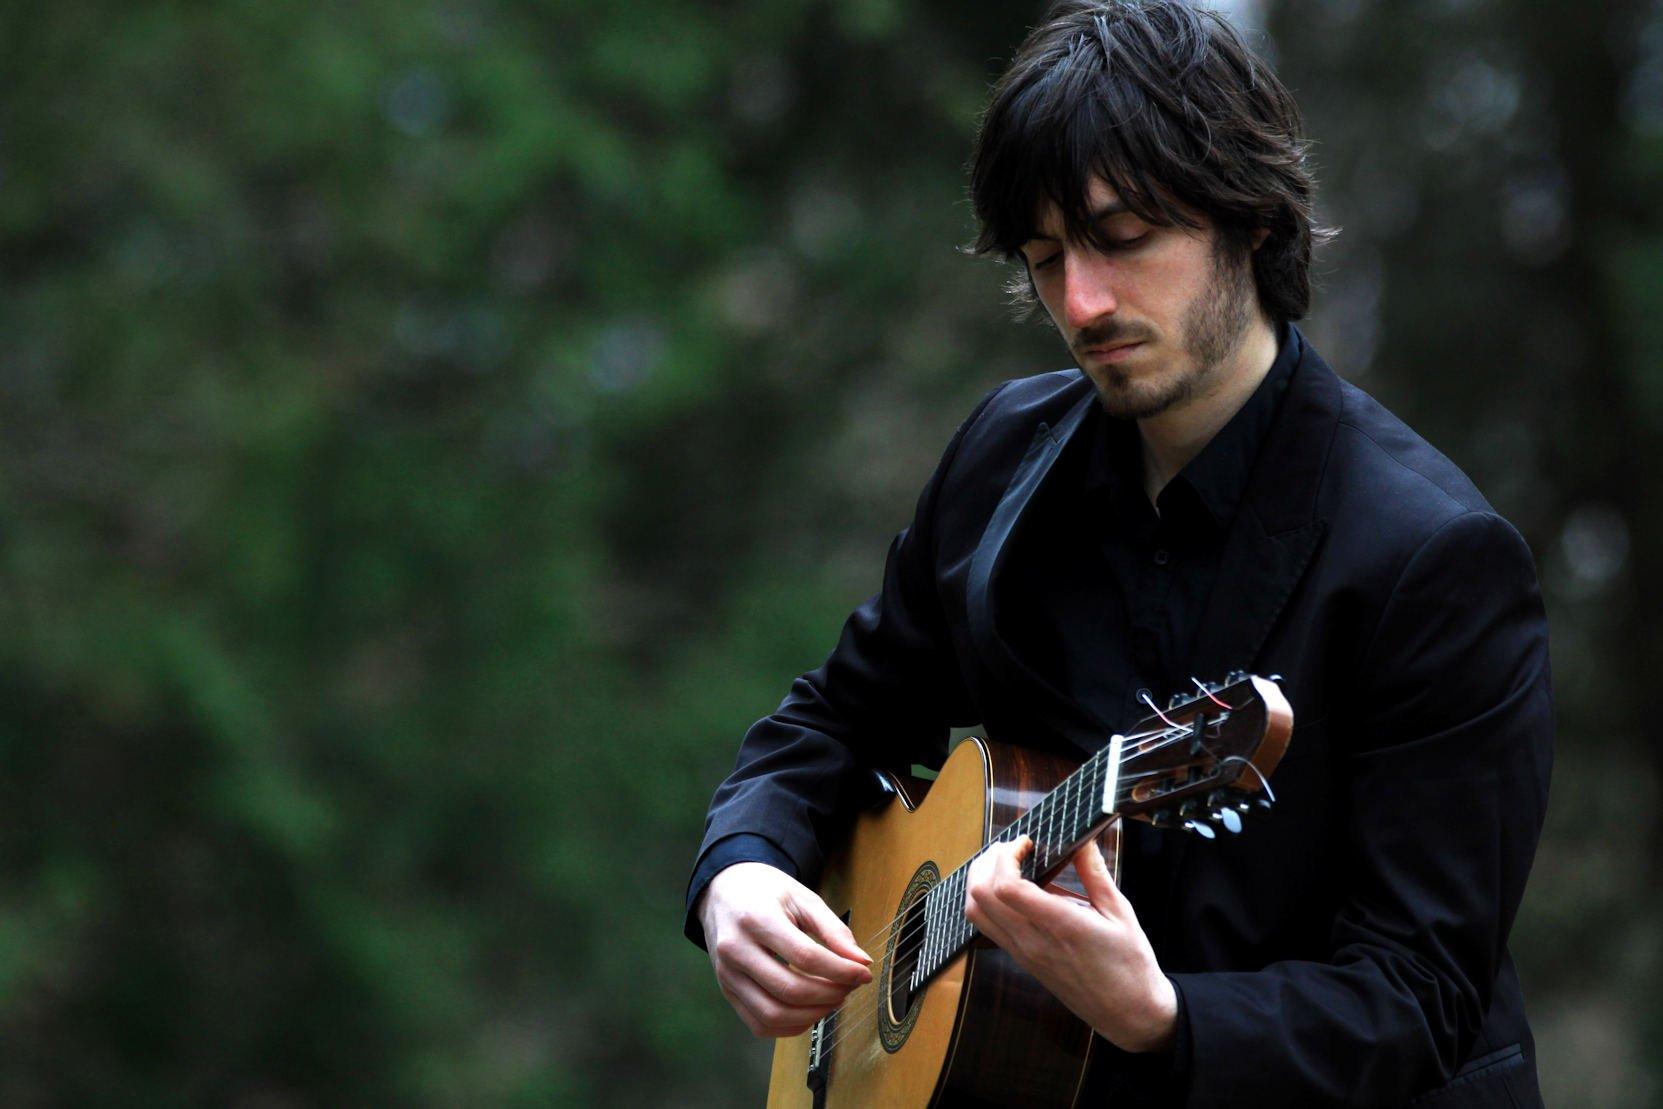 Francesco Barone - Guitarist